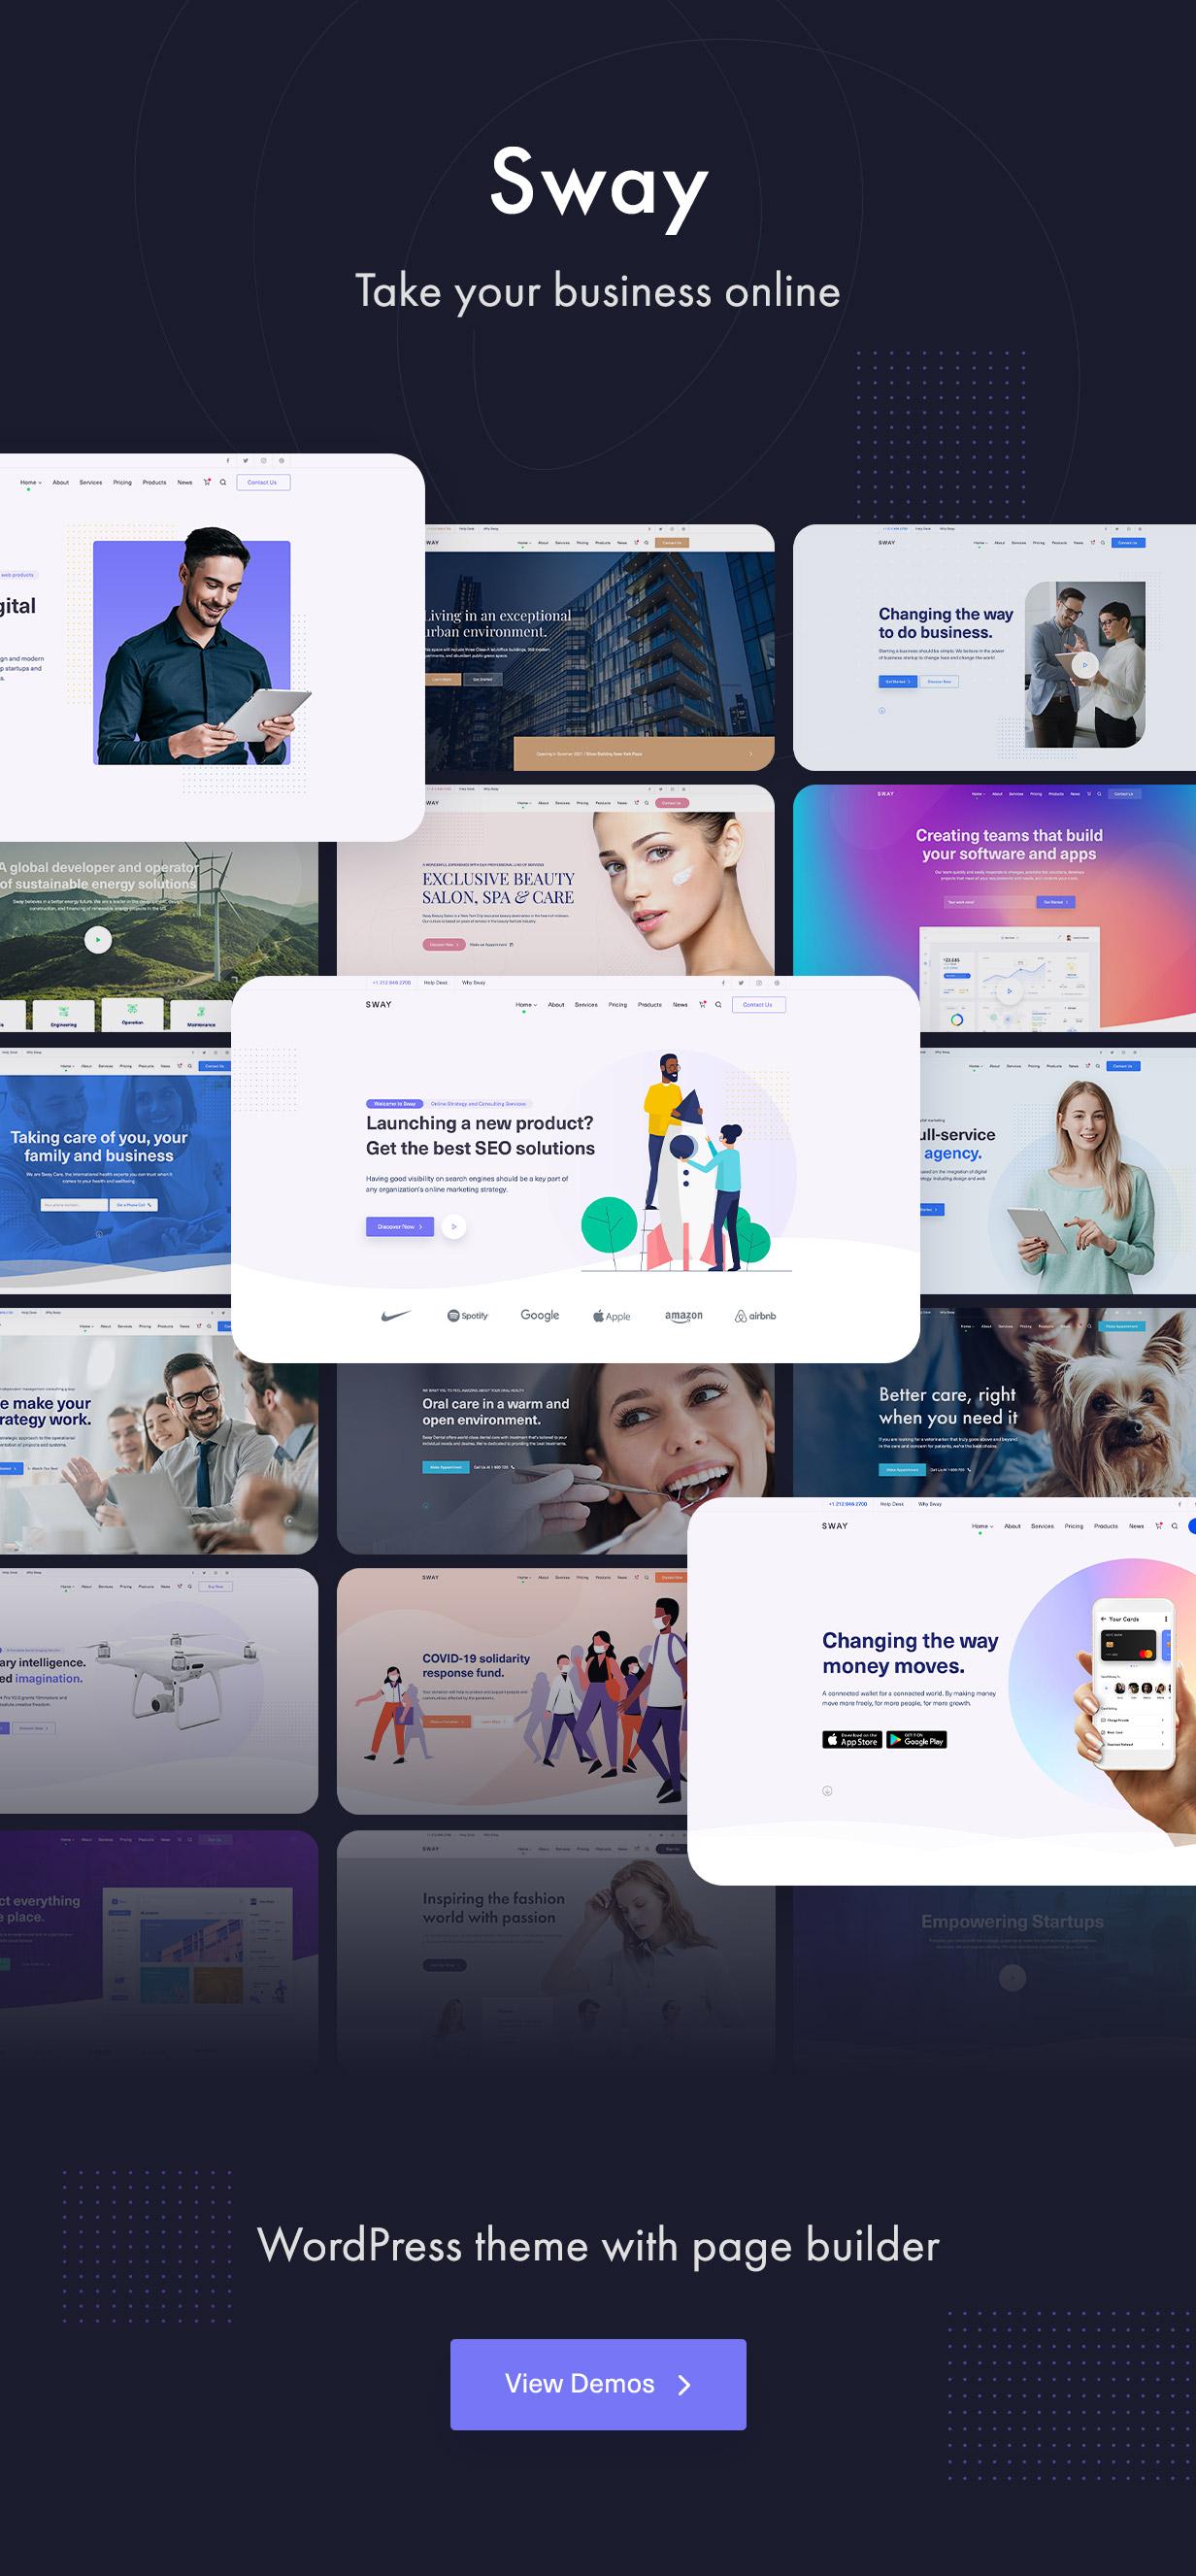 Sway - Multi-Purpose WordPress Theme with Page Builder - 1